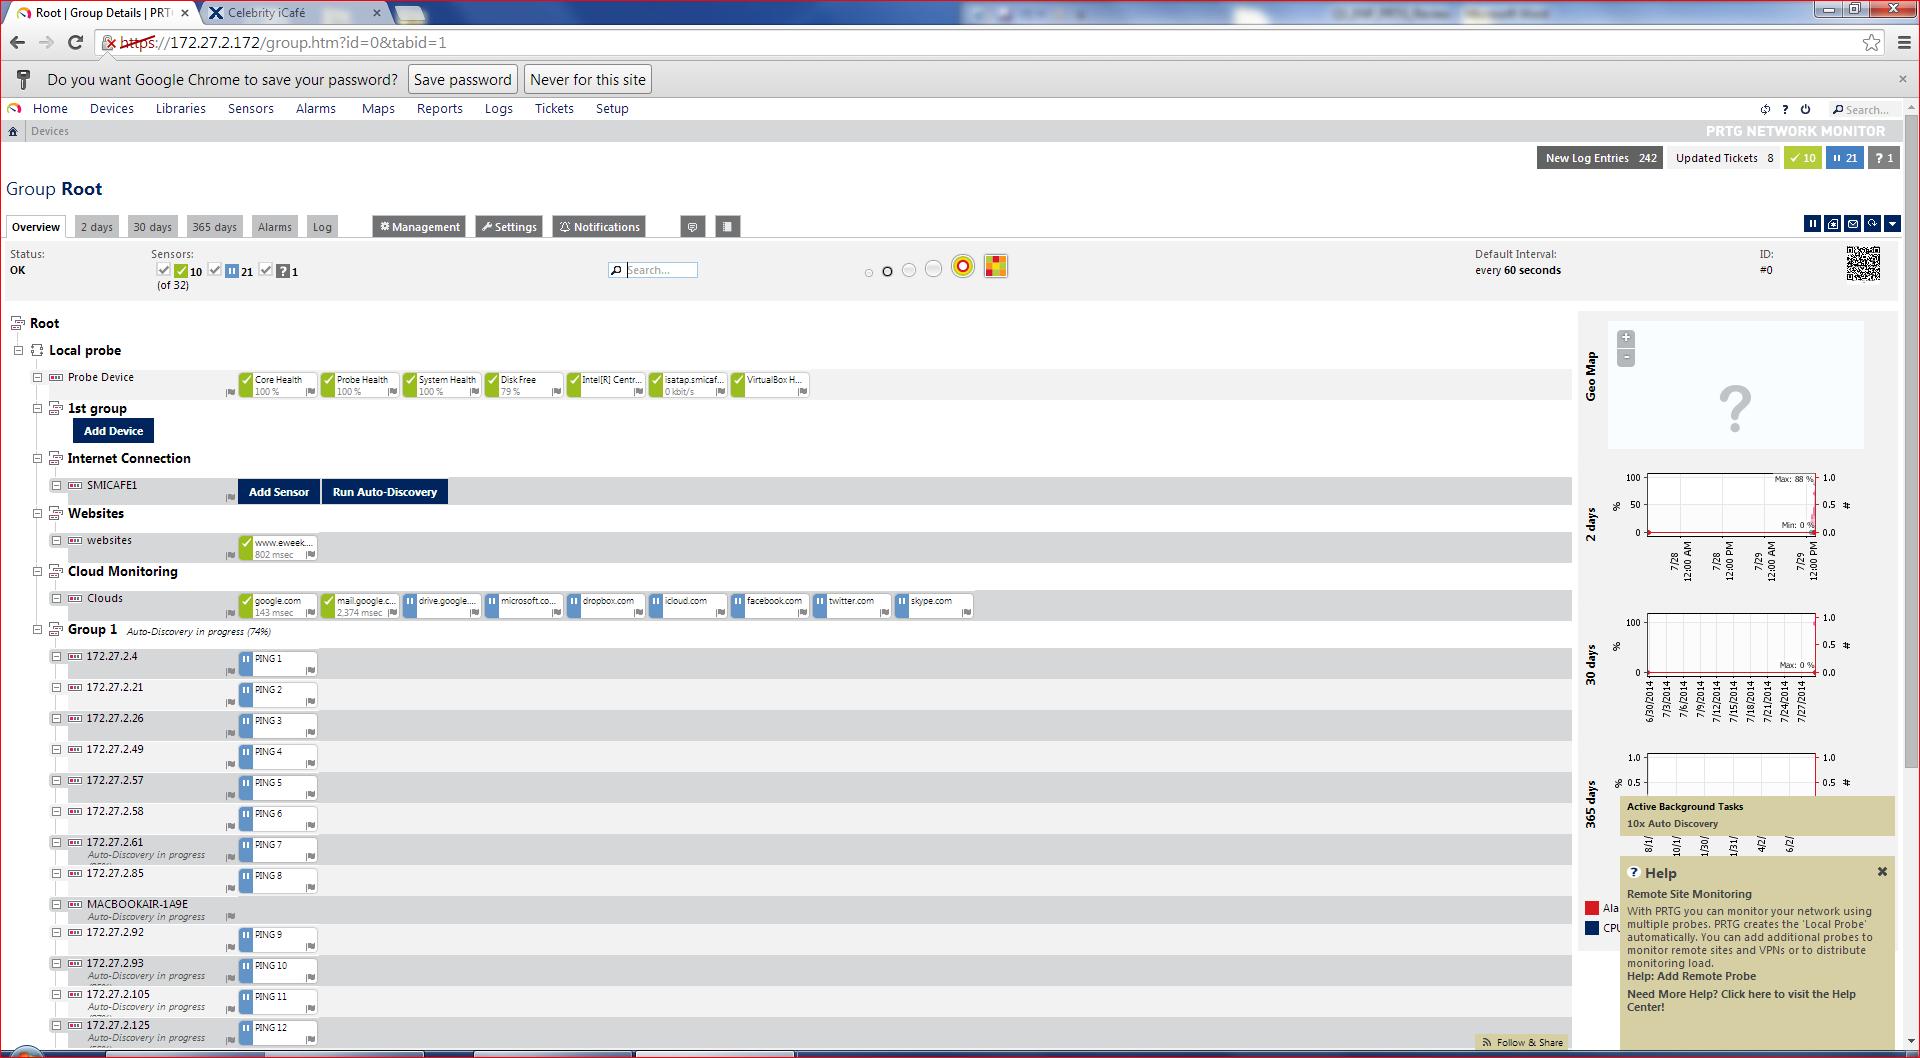 Paessler PRTG Network Monitor v14 Auto Discovery